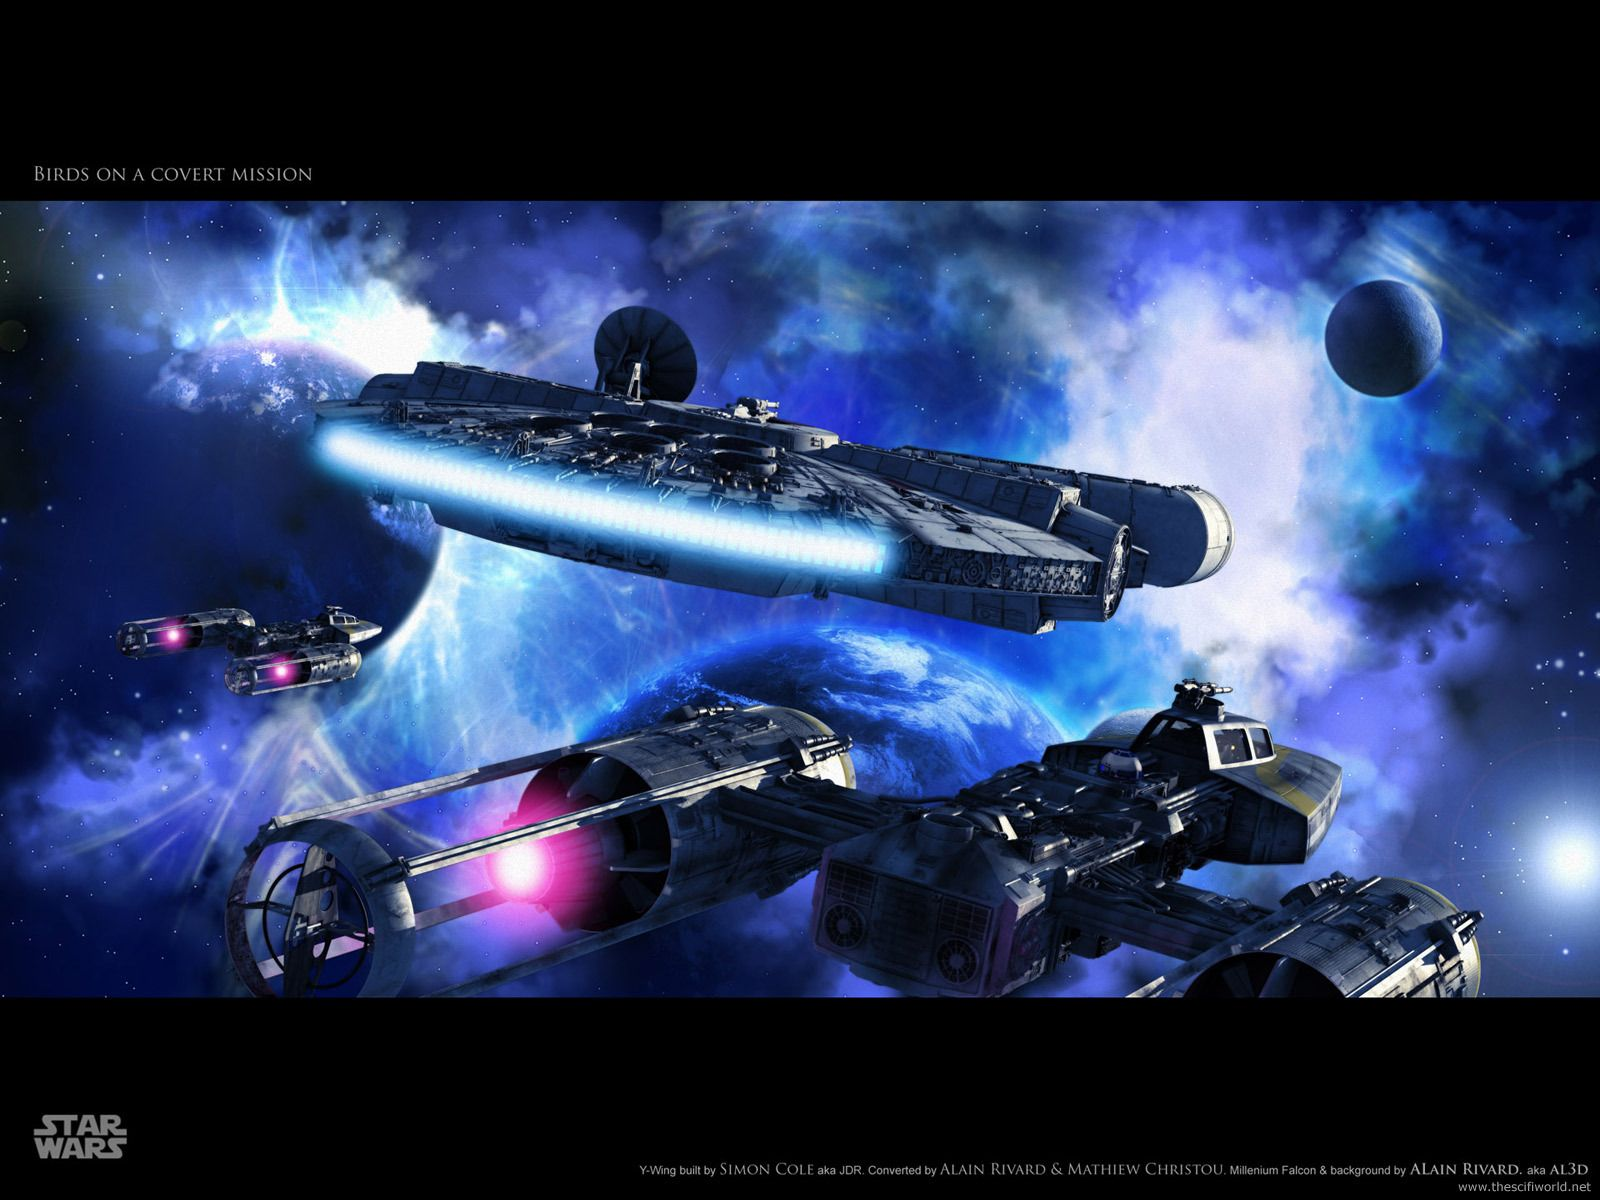 Disenos De Naves De Star Wars Robable Star Wars Wallpaper Star Wars Ships Star Wars Artwork